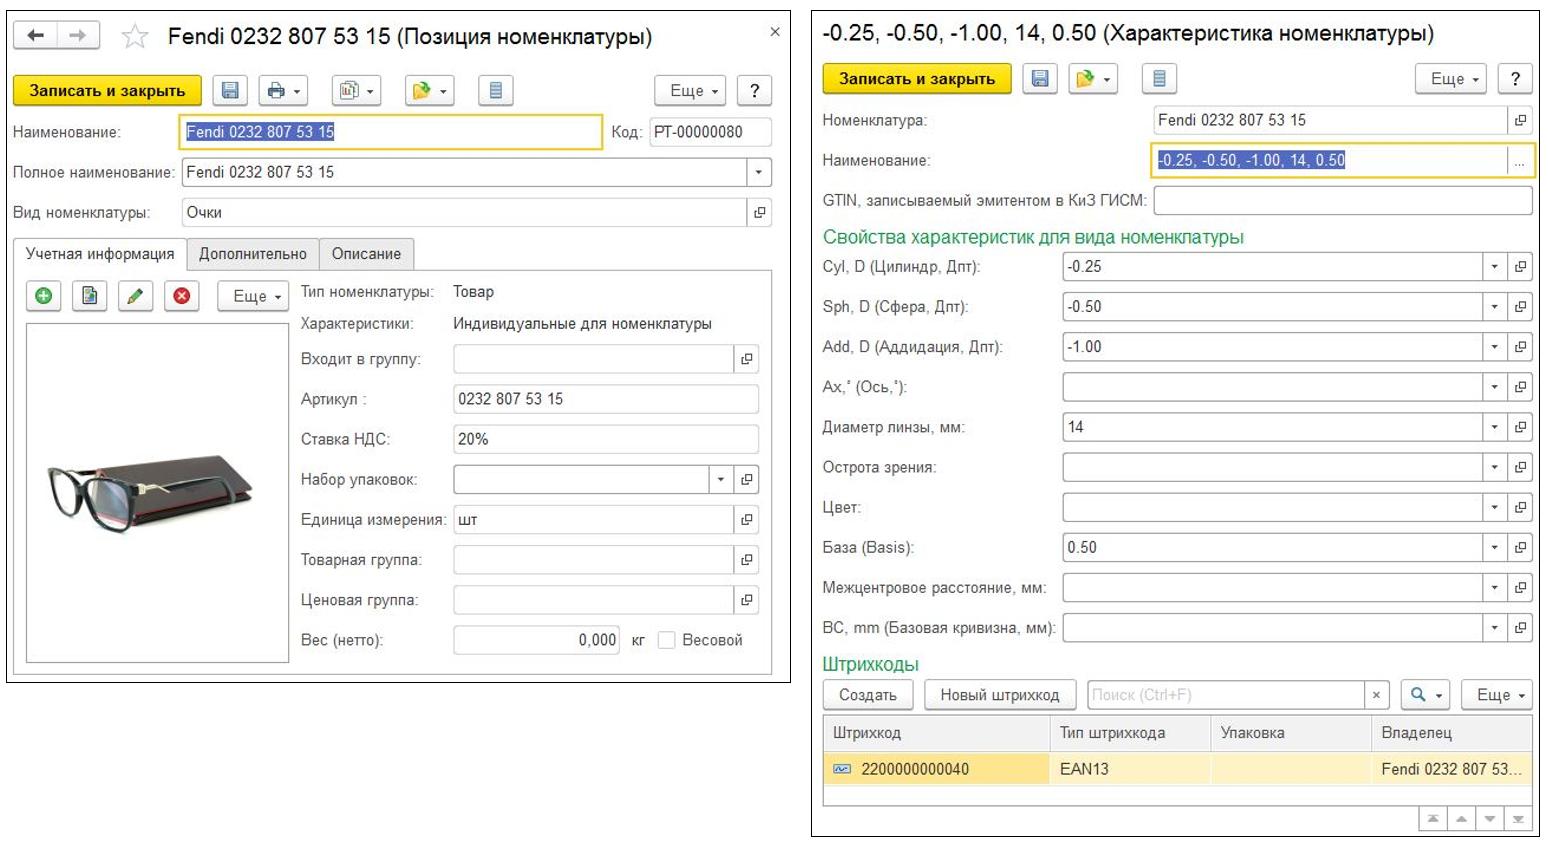 1С ДНР, 1С Донецк, Позиция номенклатуры, Характеристика номенклатуры